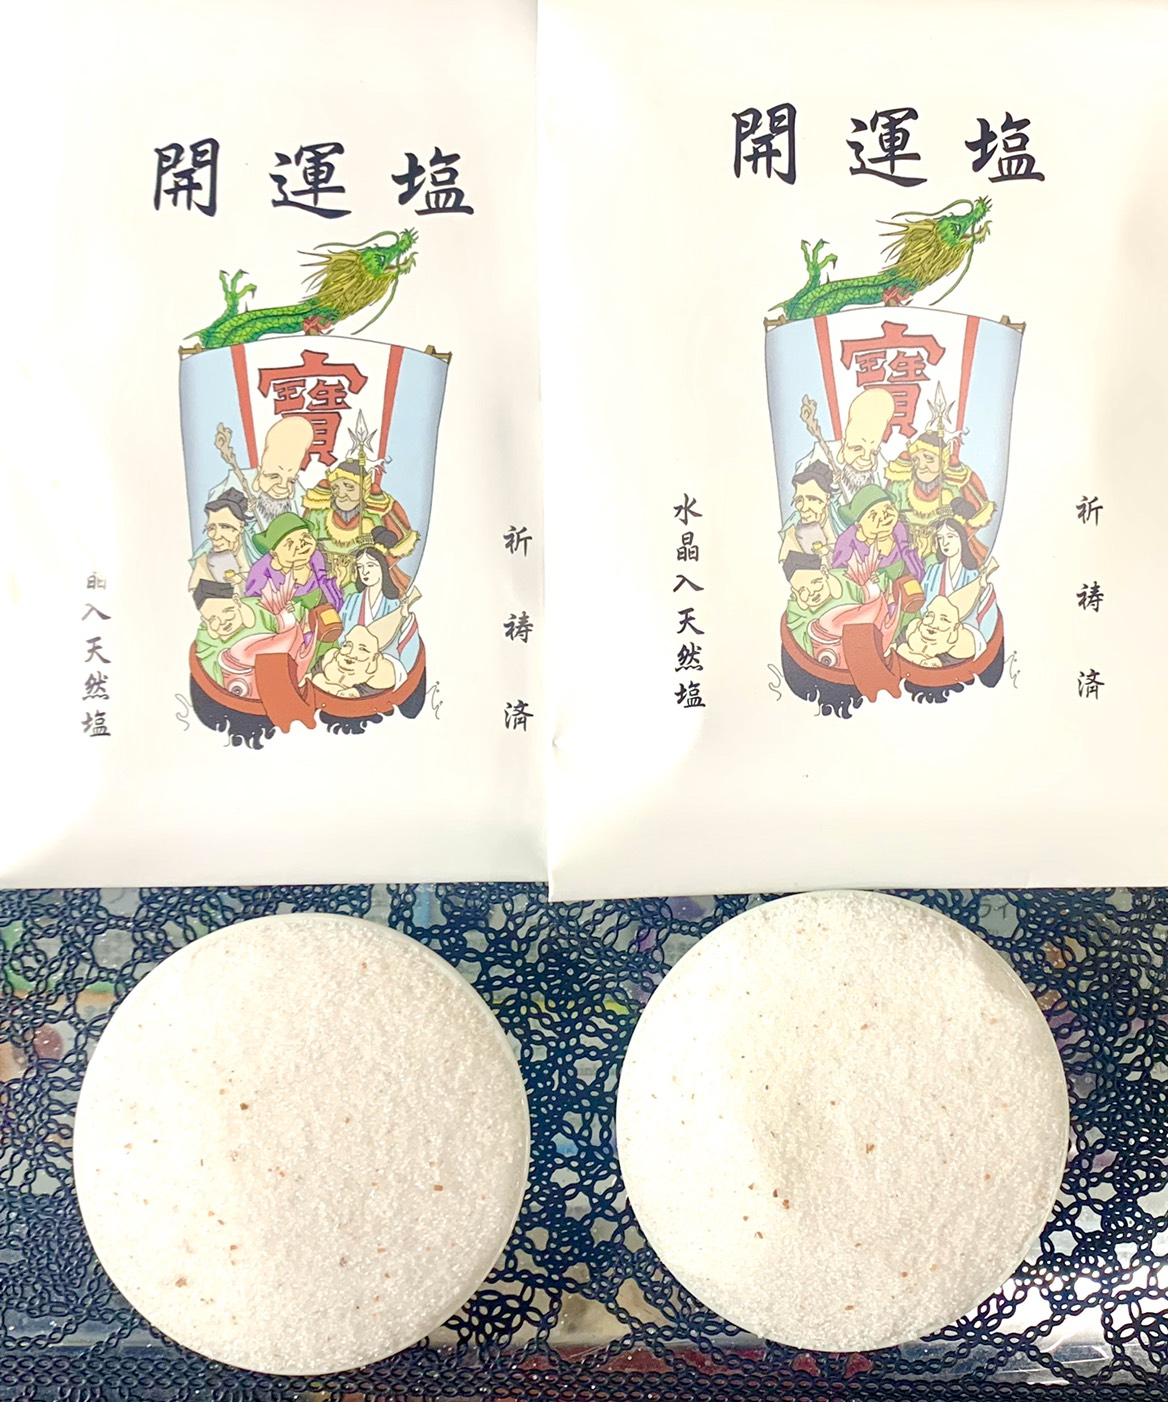 水晶入開運塩(新月)2個セット 送料無料